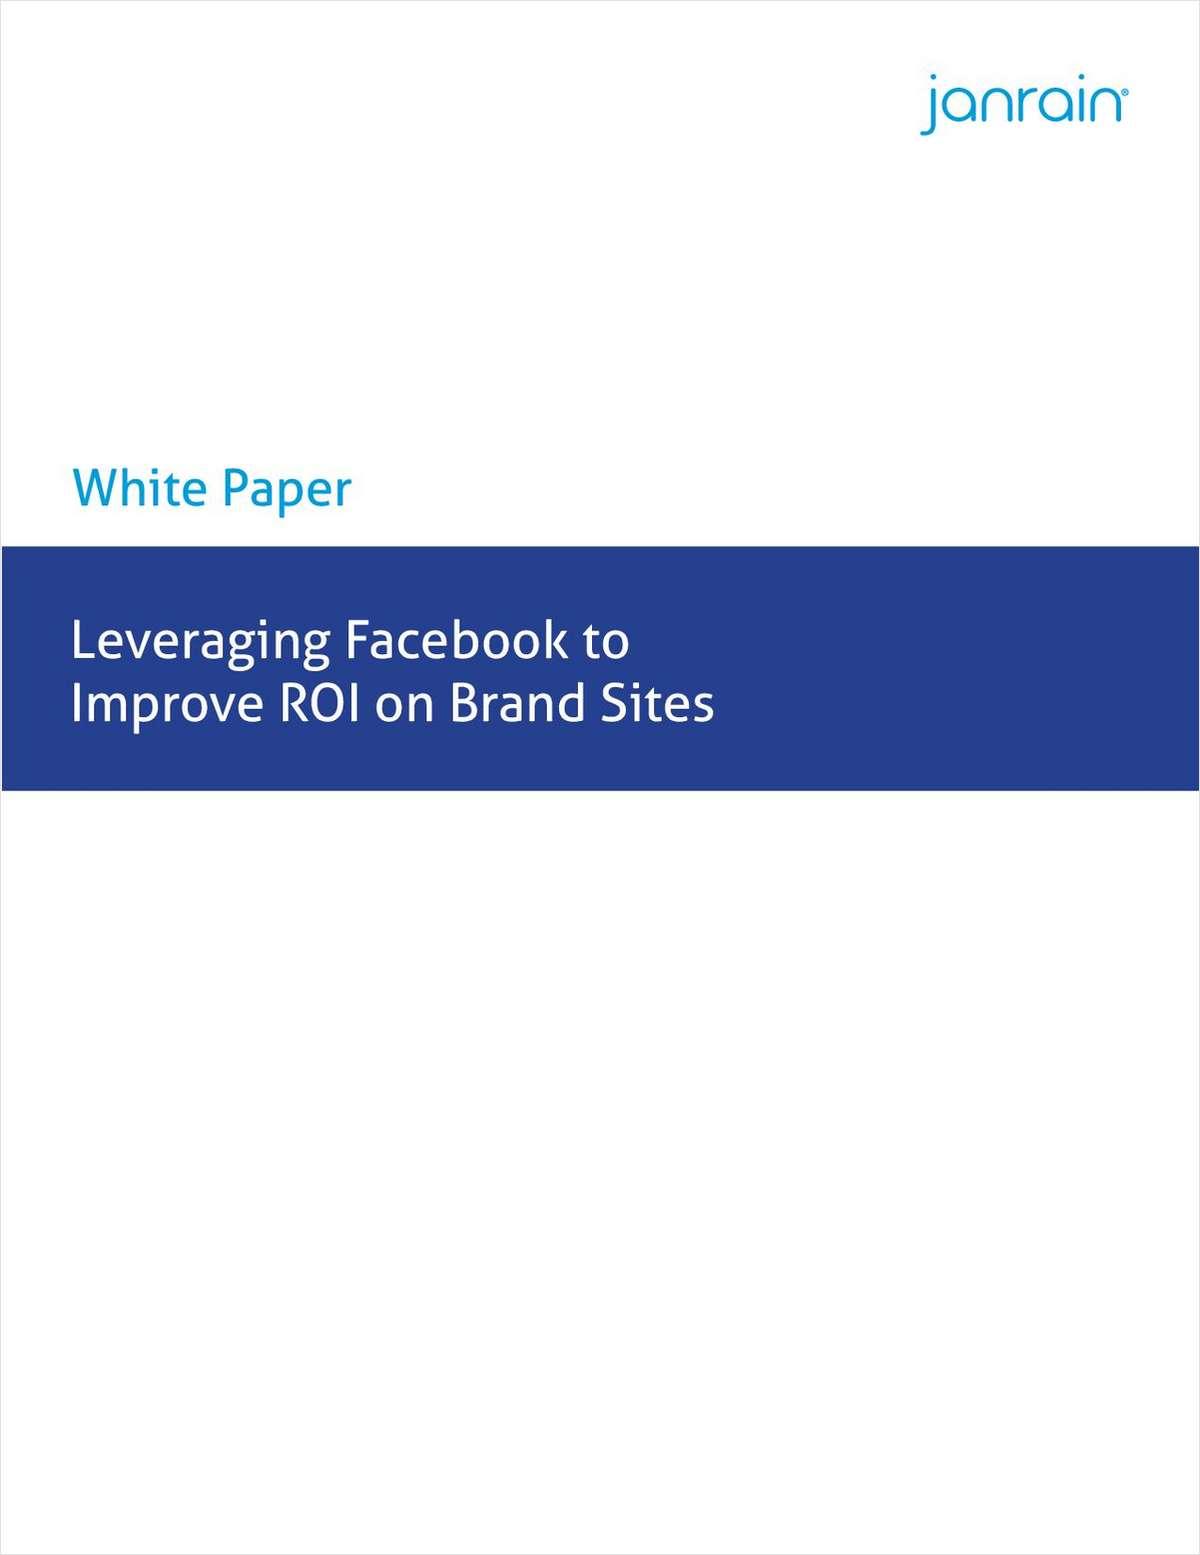 Leveraging Facebook to Improve ROI on Brand Sites